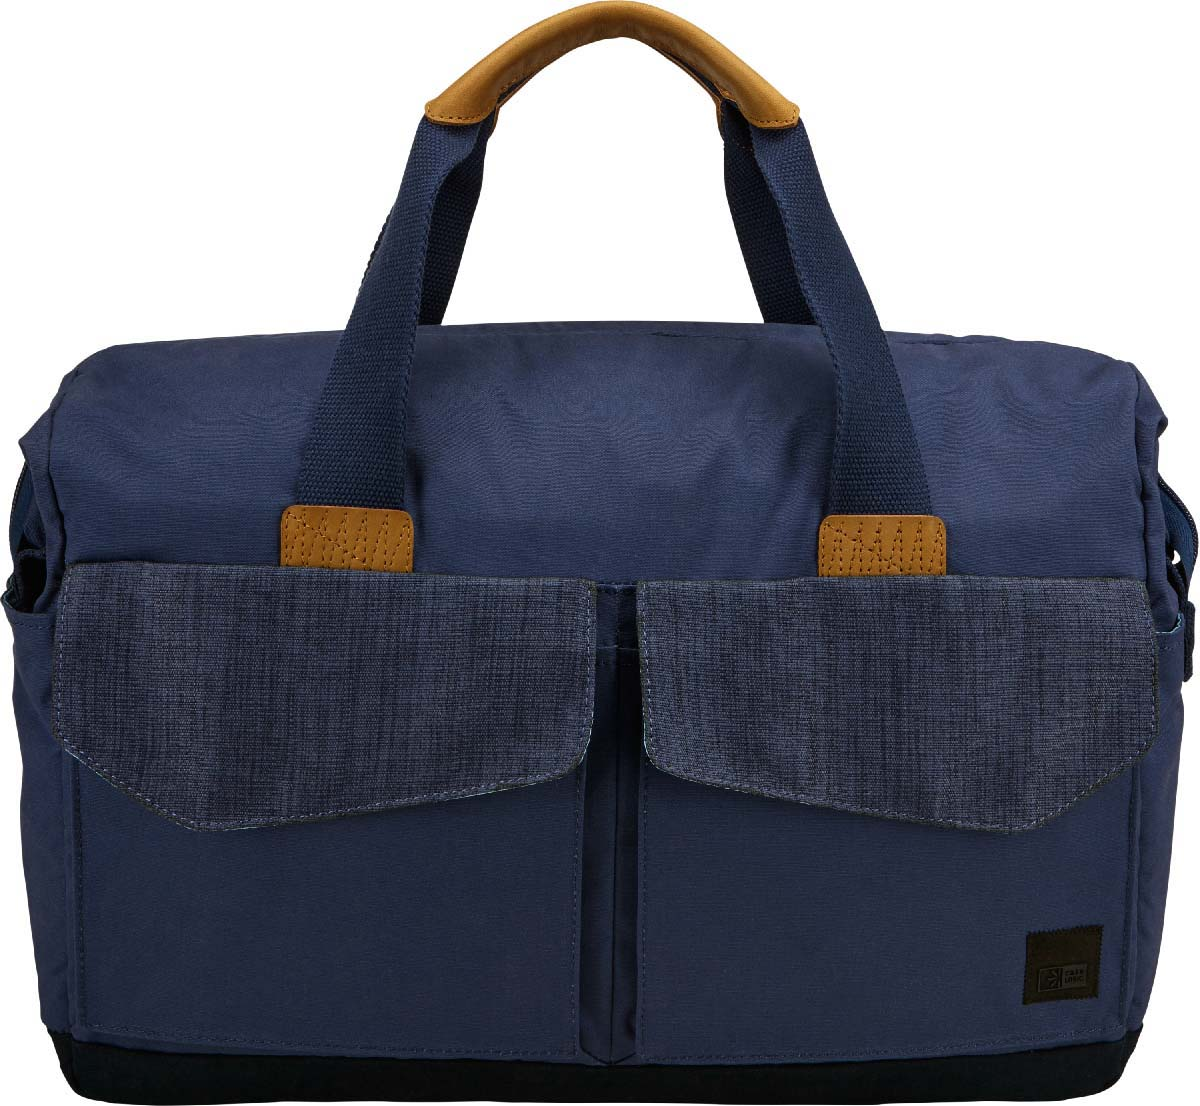 Case Logic LoDo Blue, сумка для ноутбука 15,6